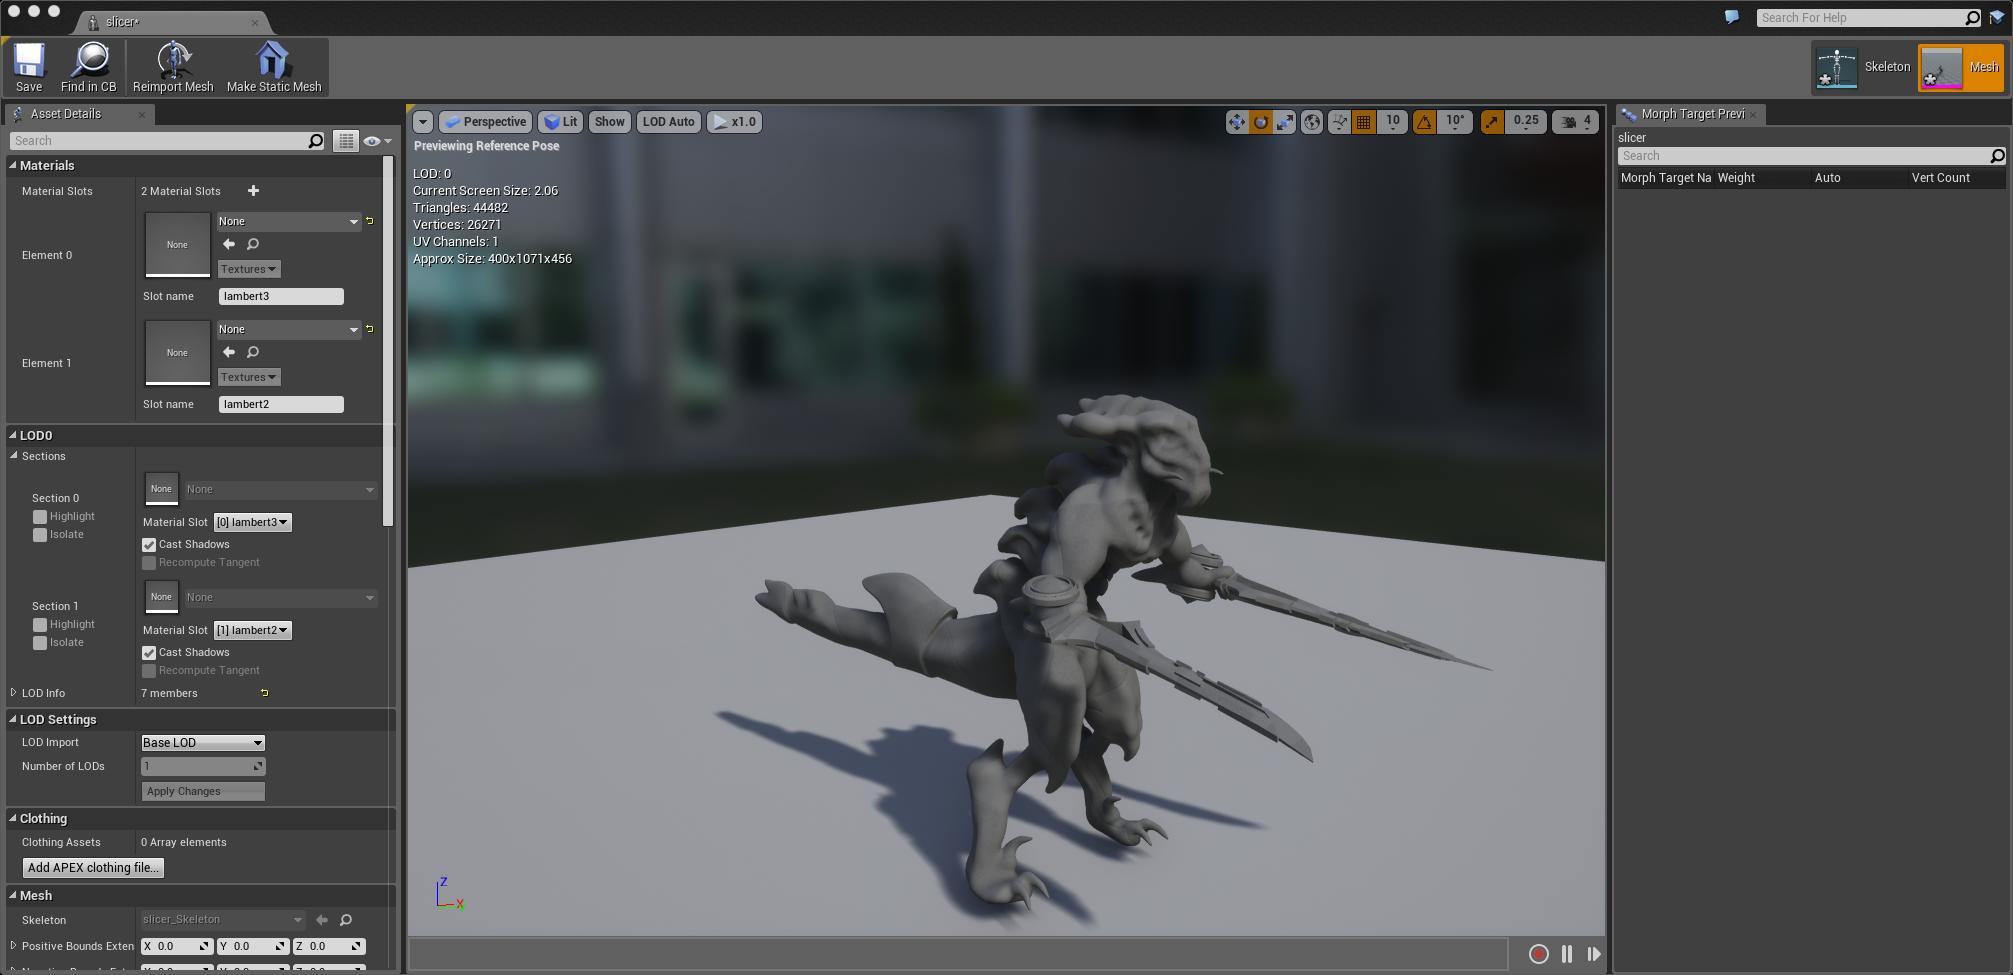 The Kaiju model